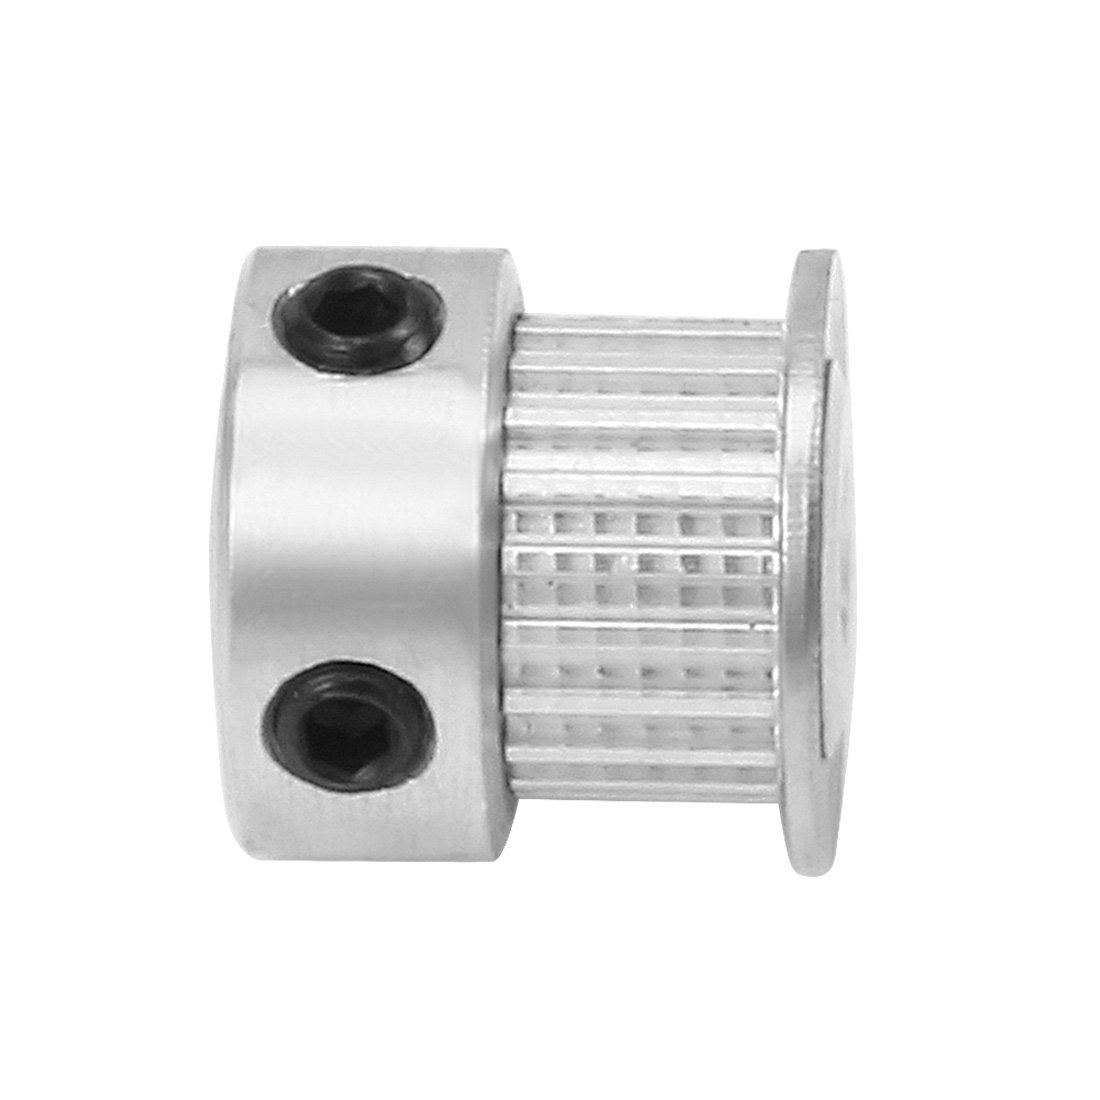 uxcell Aluminum MXL 20 Teeth 7mm Bore Timing Belt Idler Pulley Flange Synchronous Wheel for 6mm Belt 3D Printer CNC